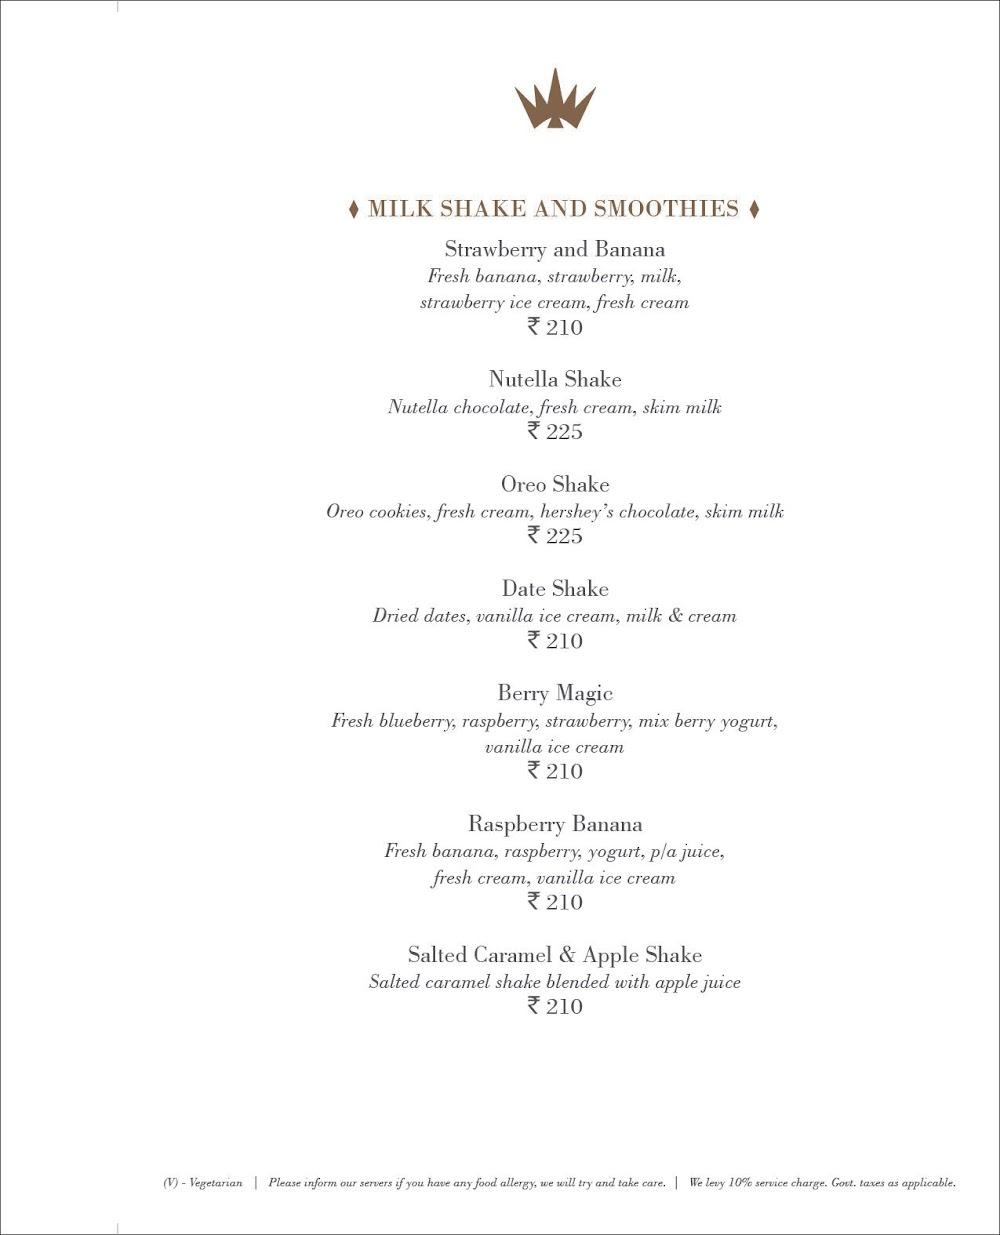 Pranzi menu 21